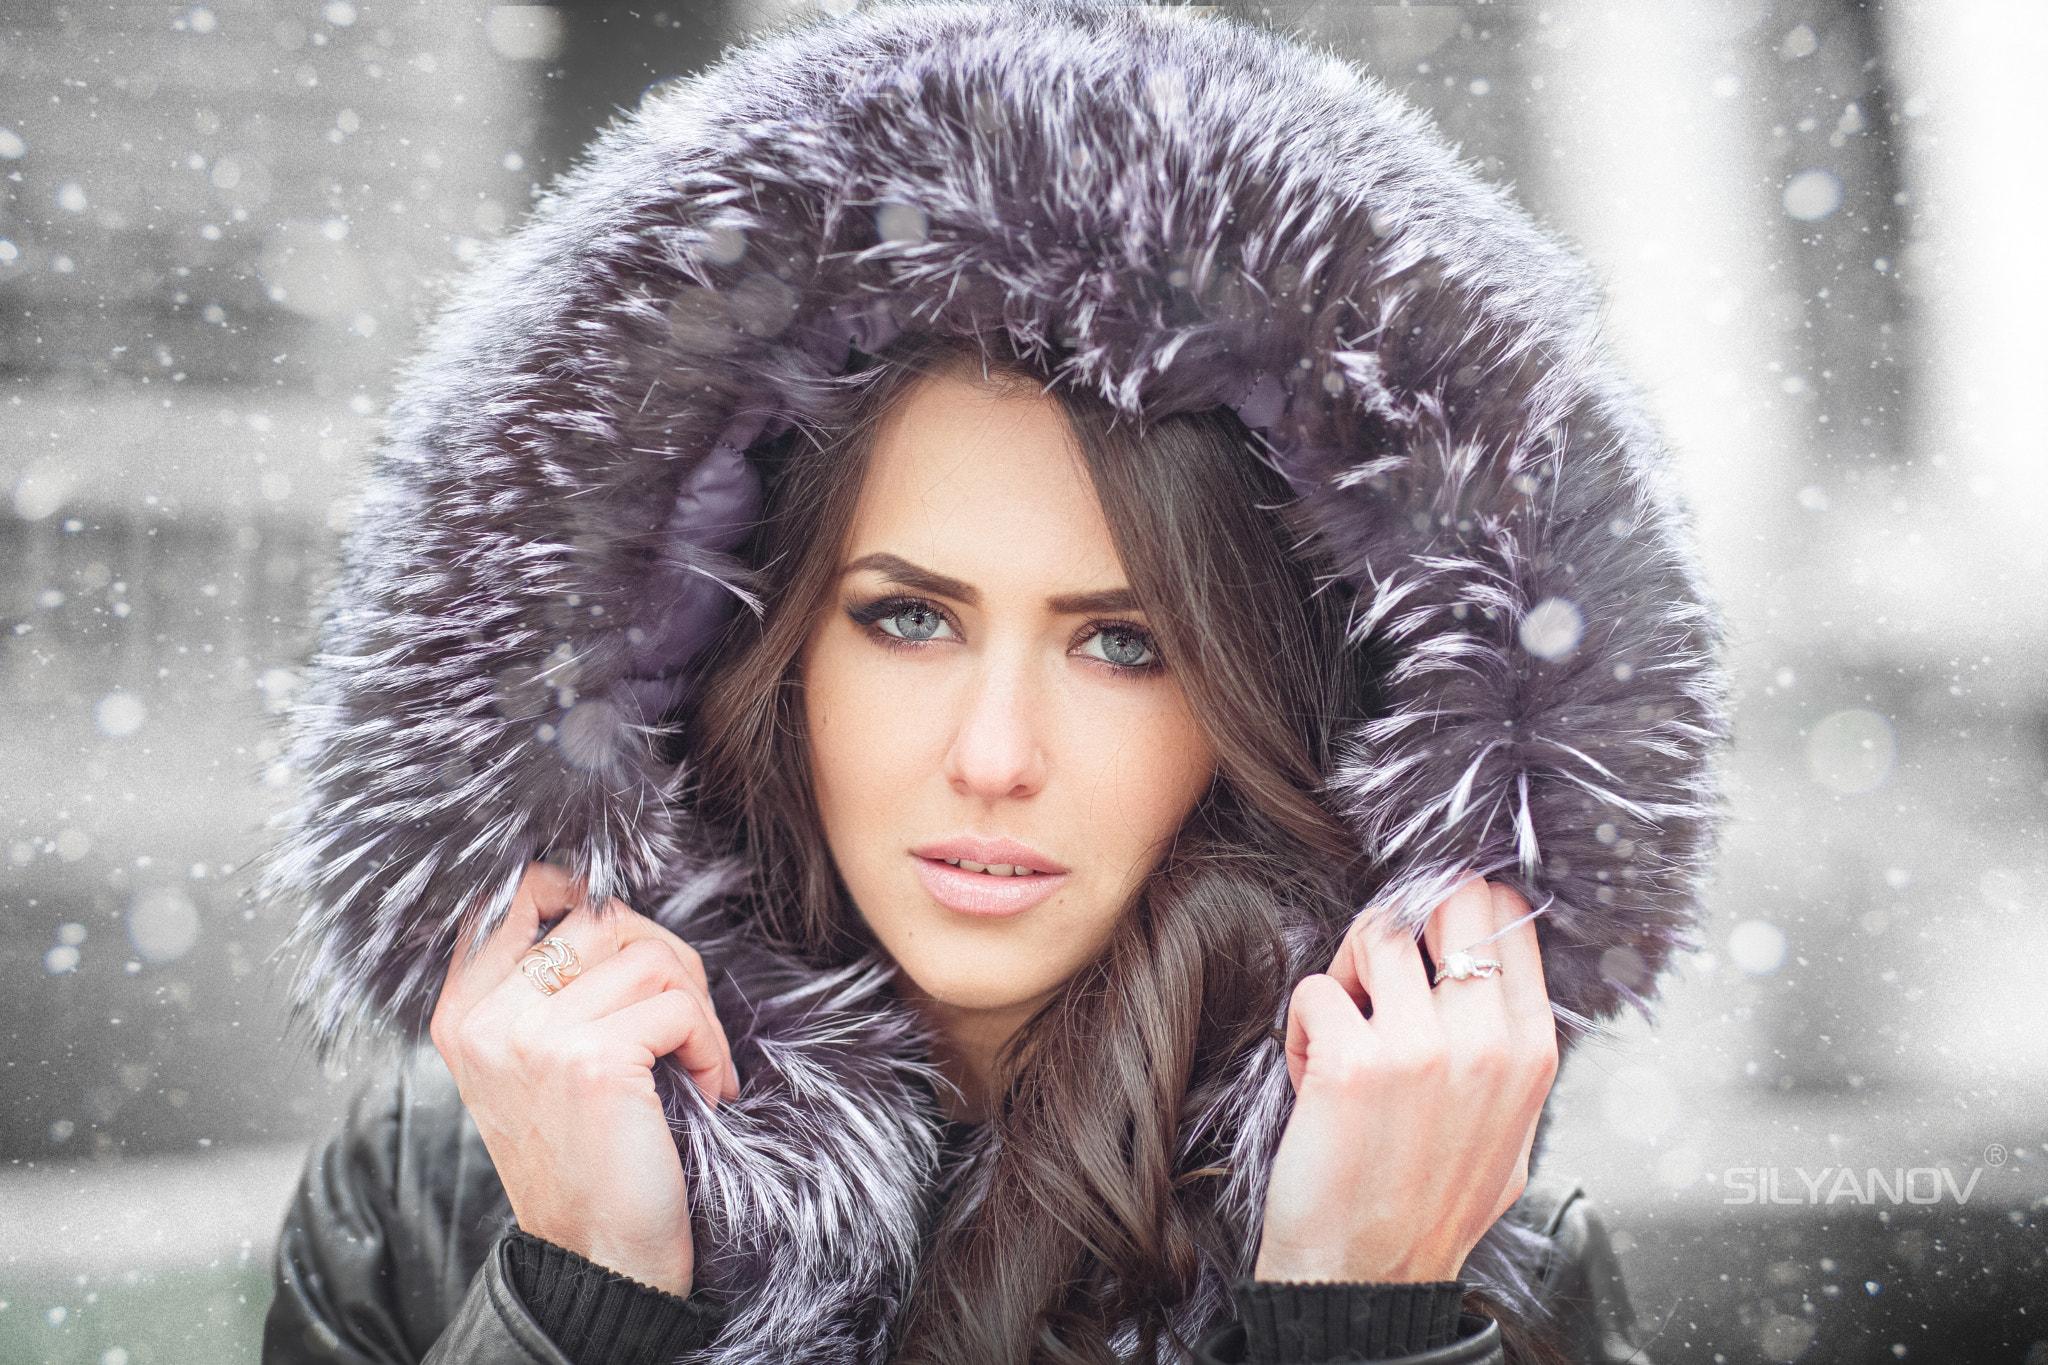 People 2048x1365 women Stanislav Silyanov hoods brunette model winter coats long hair long hair wavy hair portrait Arina gray eyes